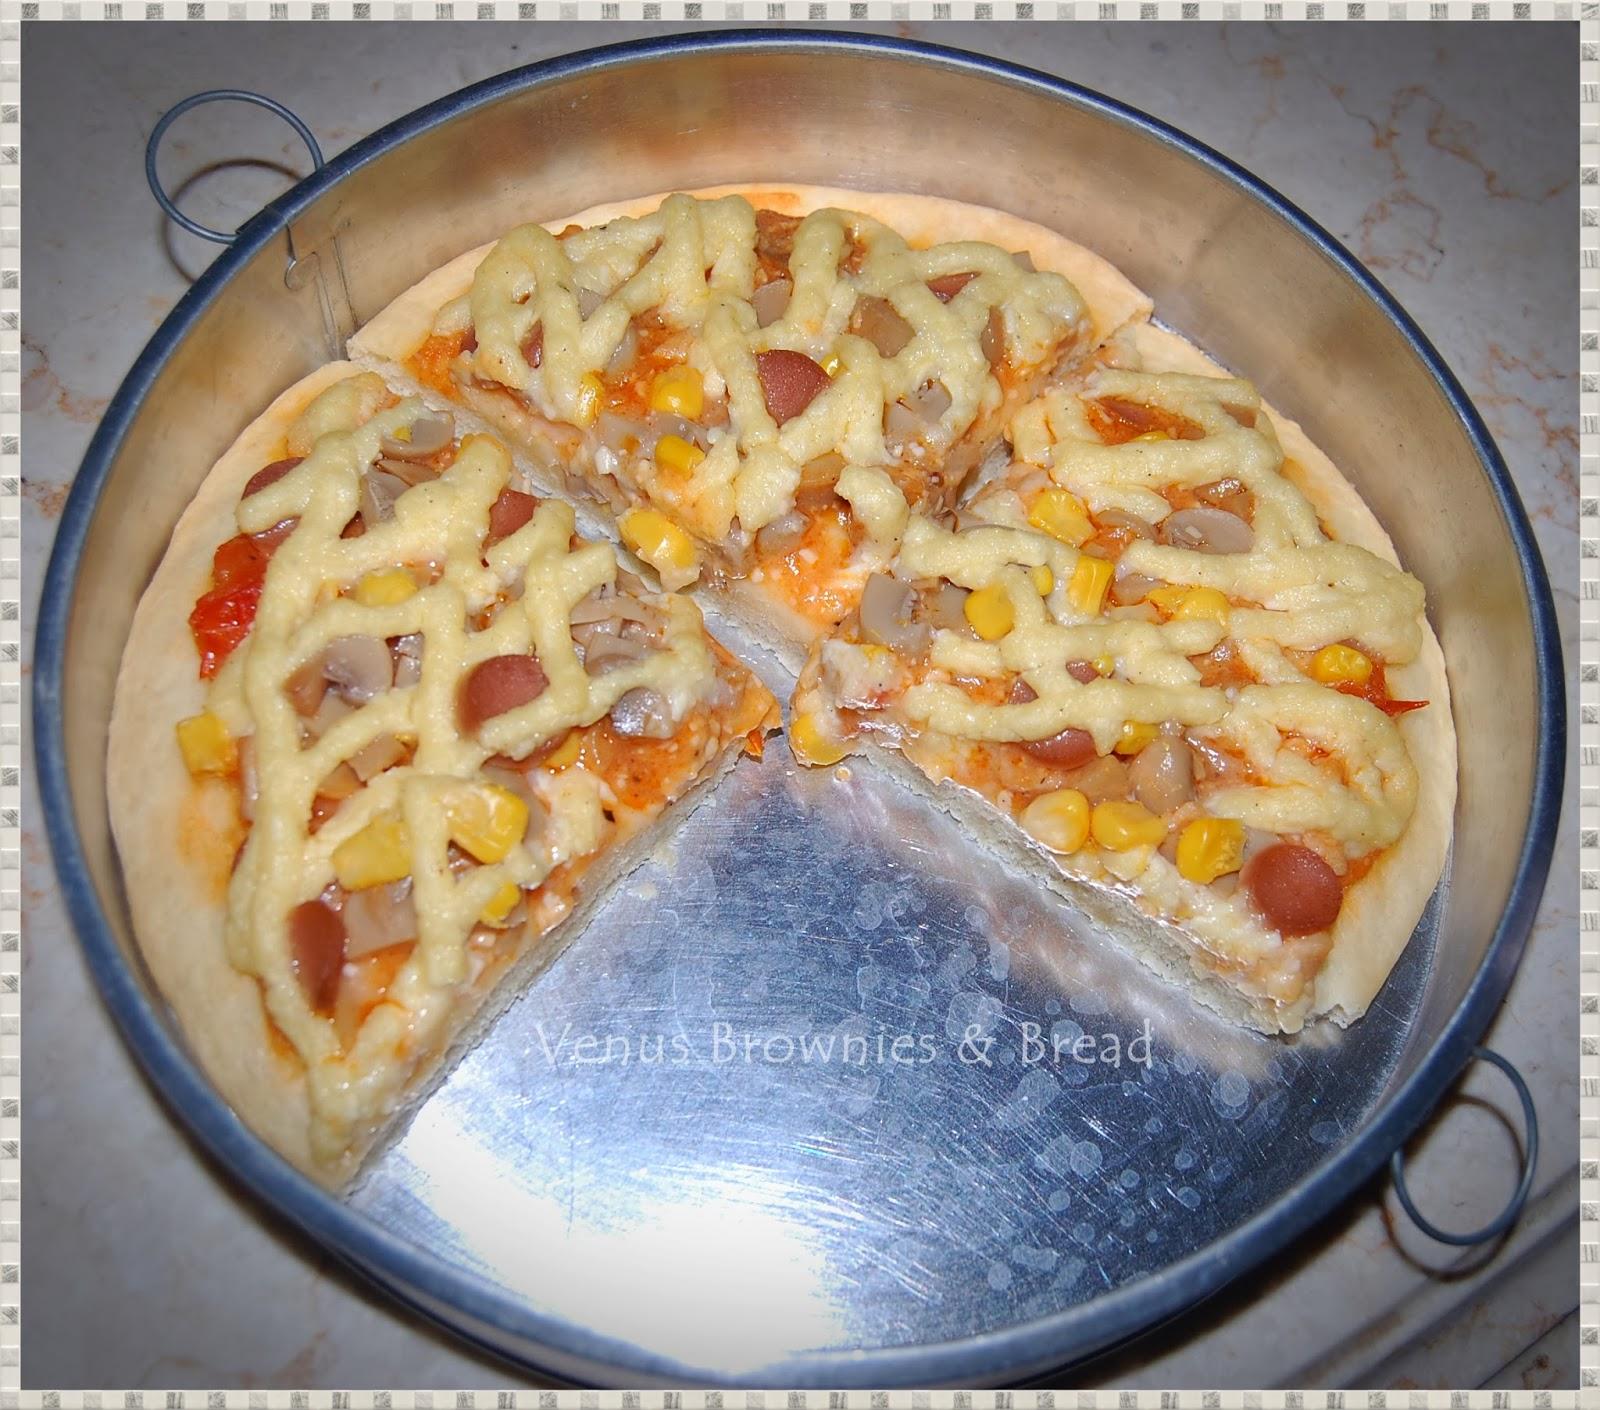 Venus Brownies & Bread: Cheddar Chicken With Cheddar Sauce